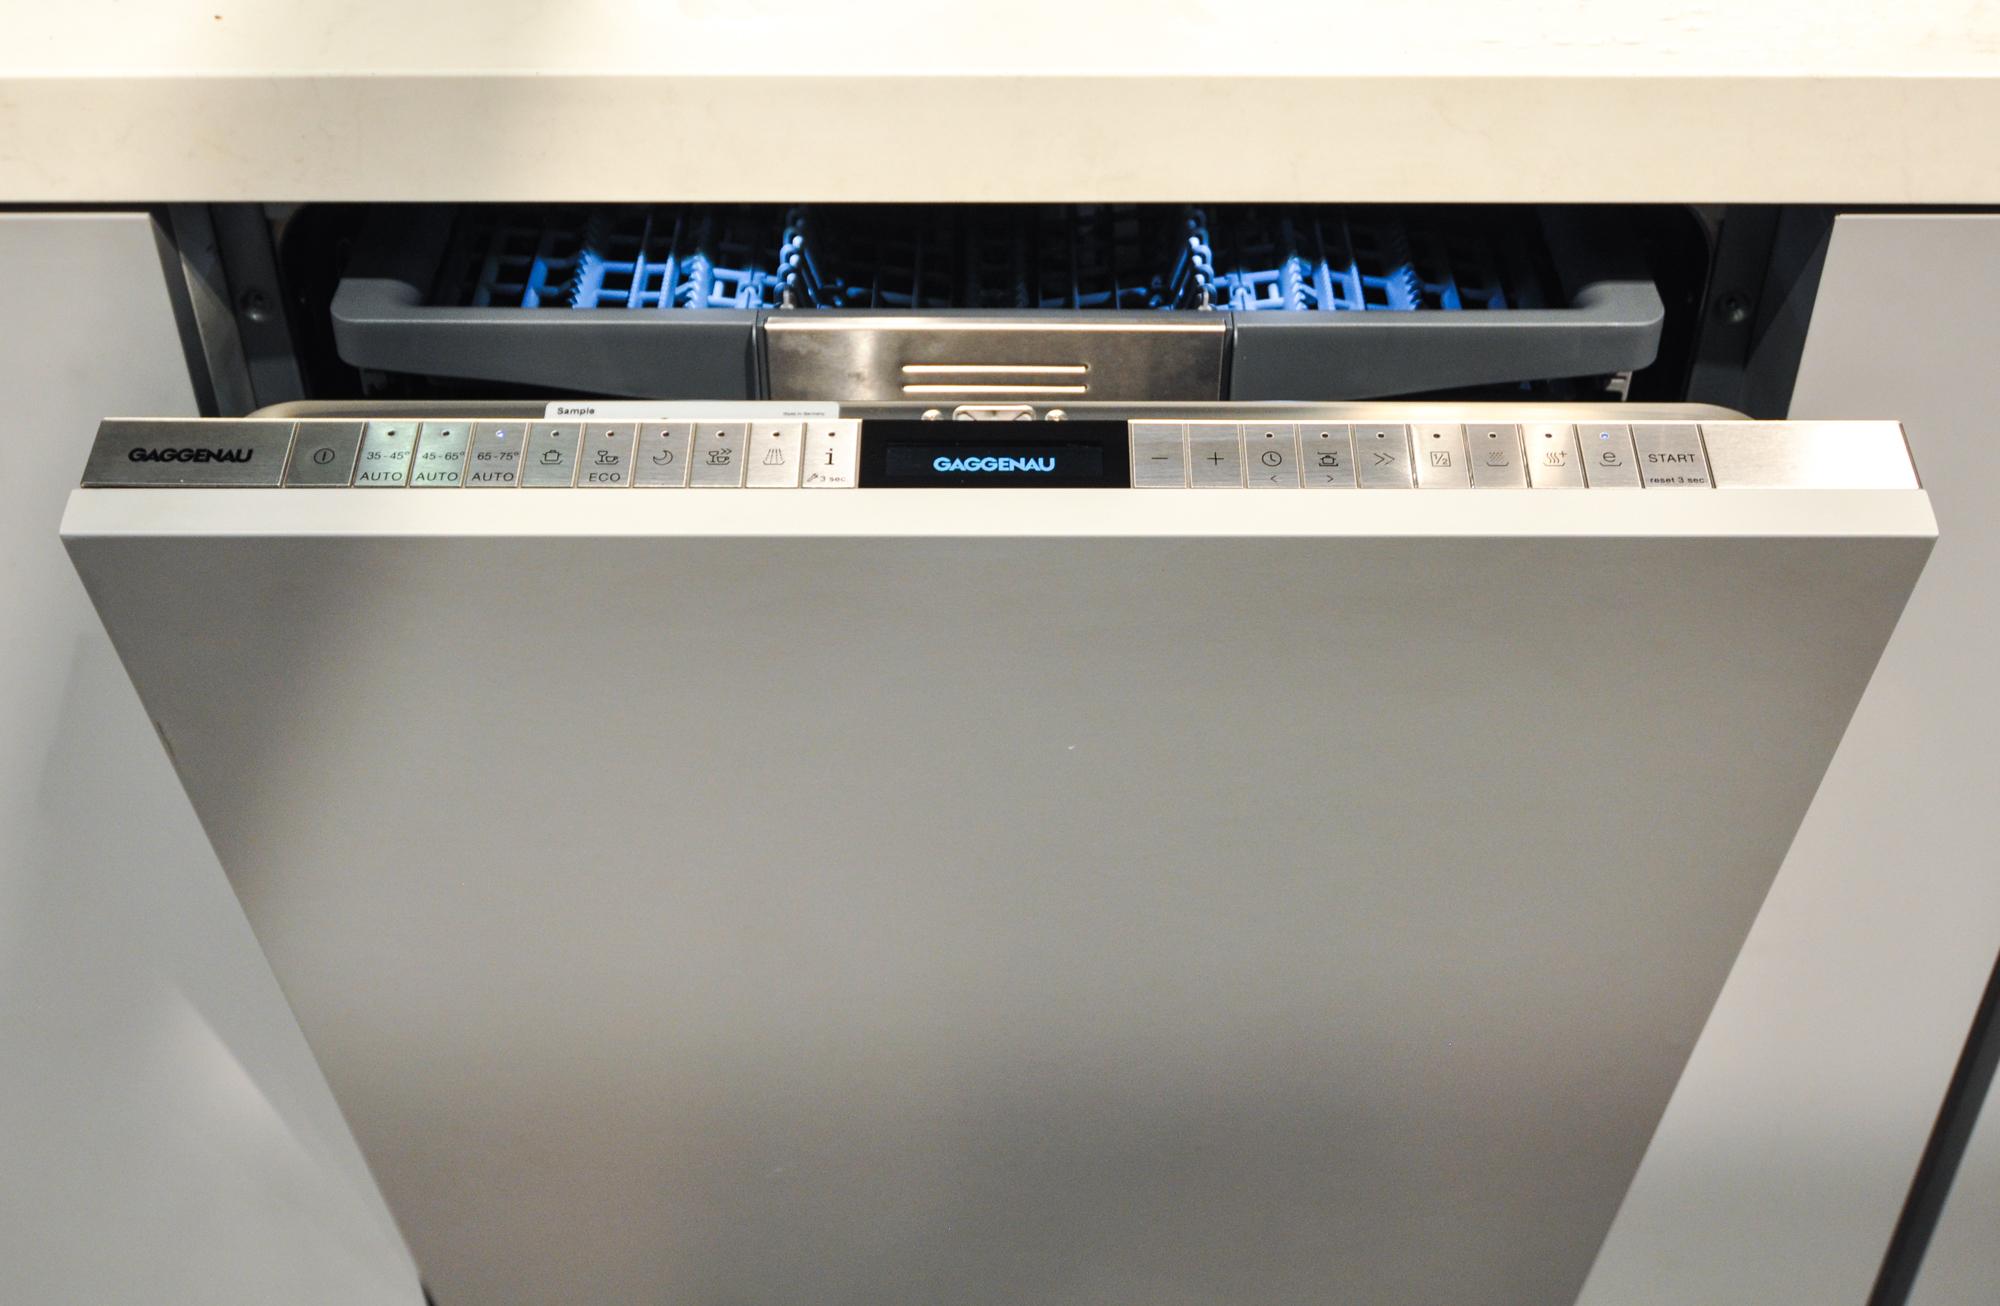 best kitchen appliance brand mid century table gaggenau's new dishwasher offers high-tech luxury ...